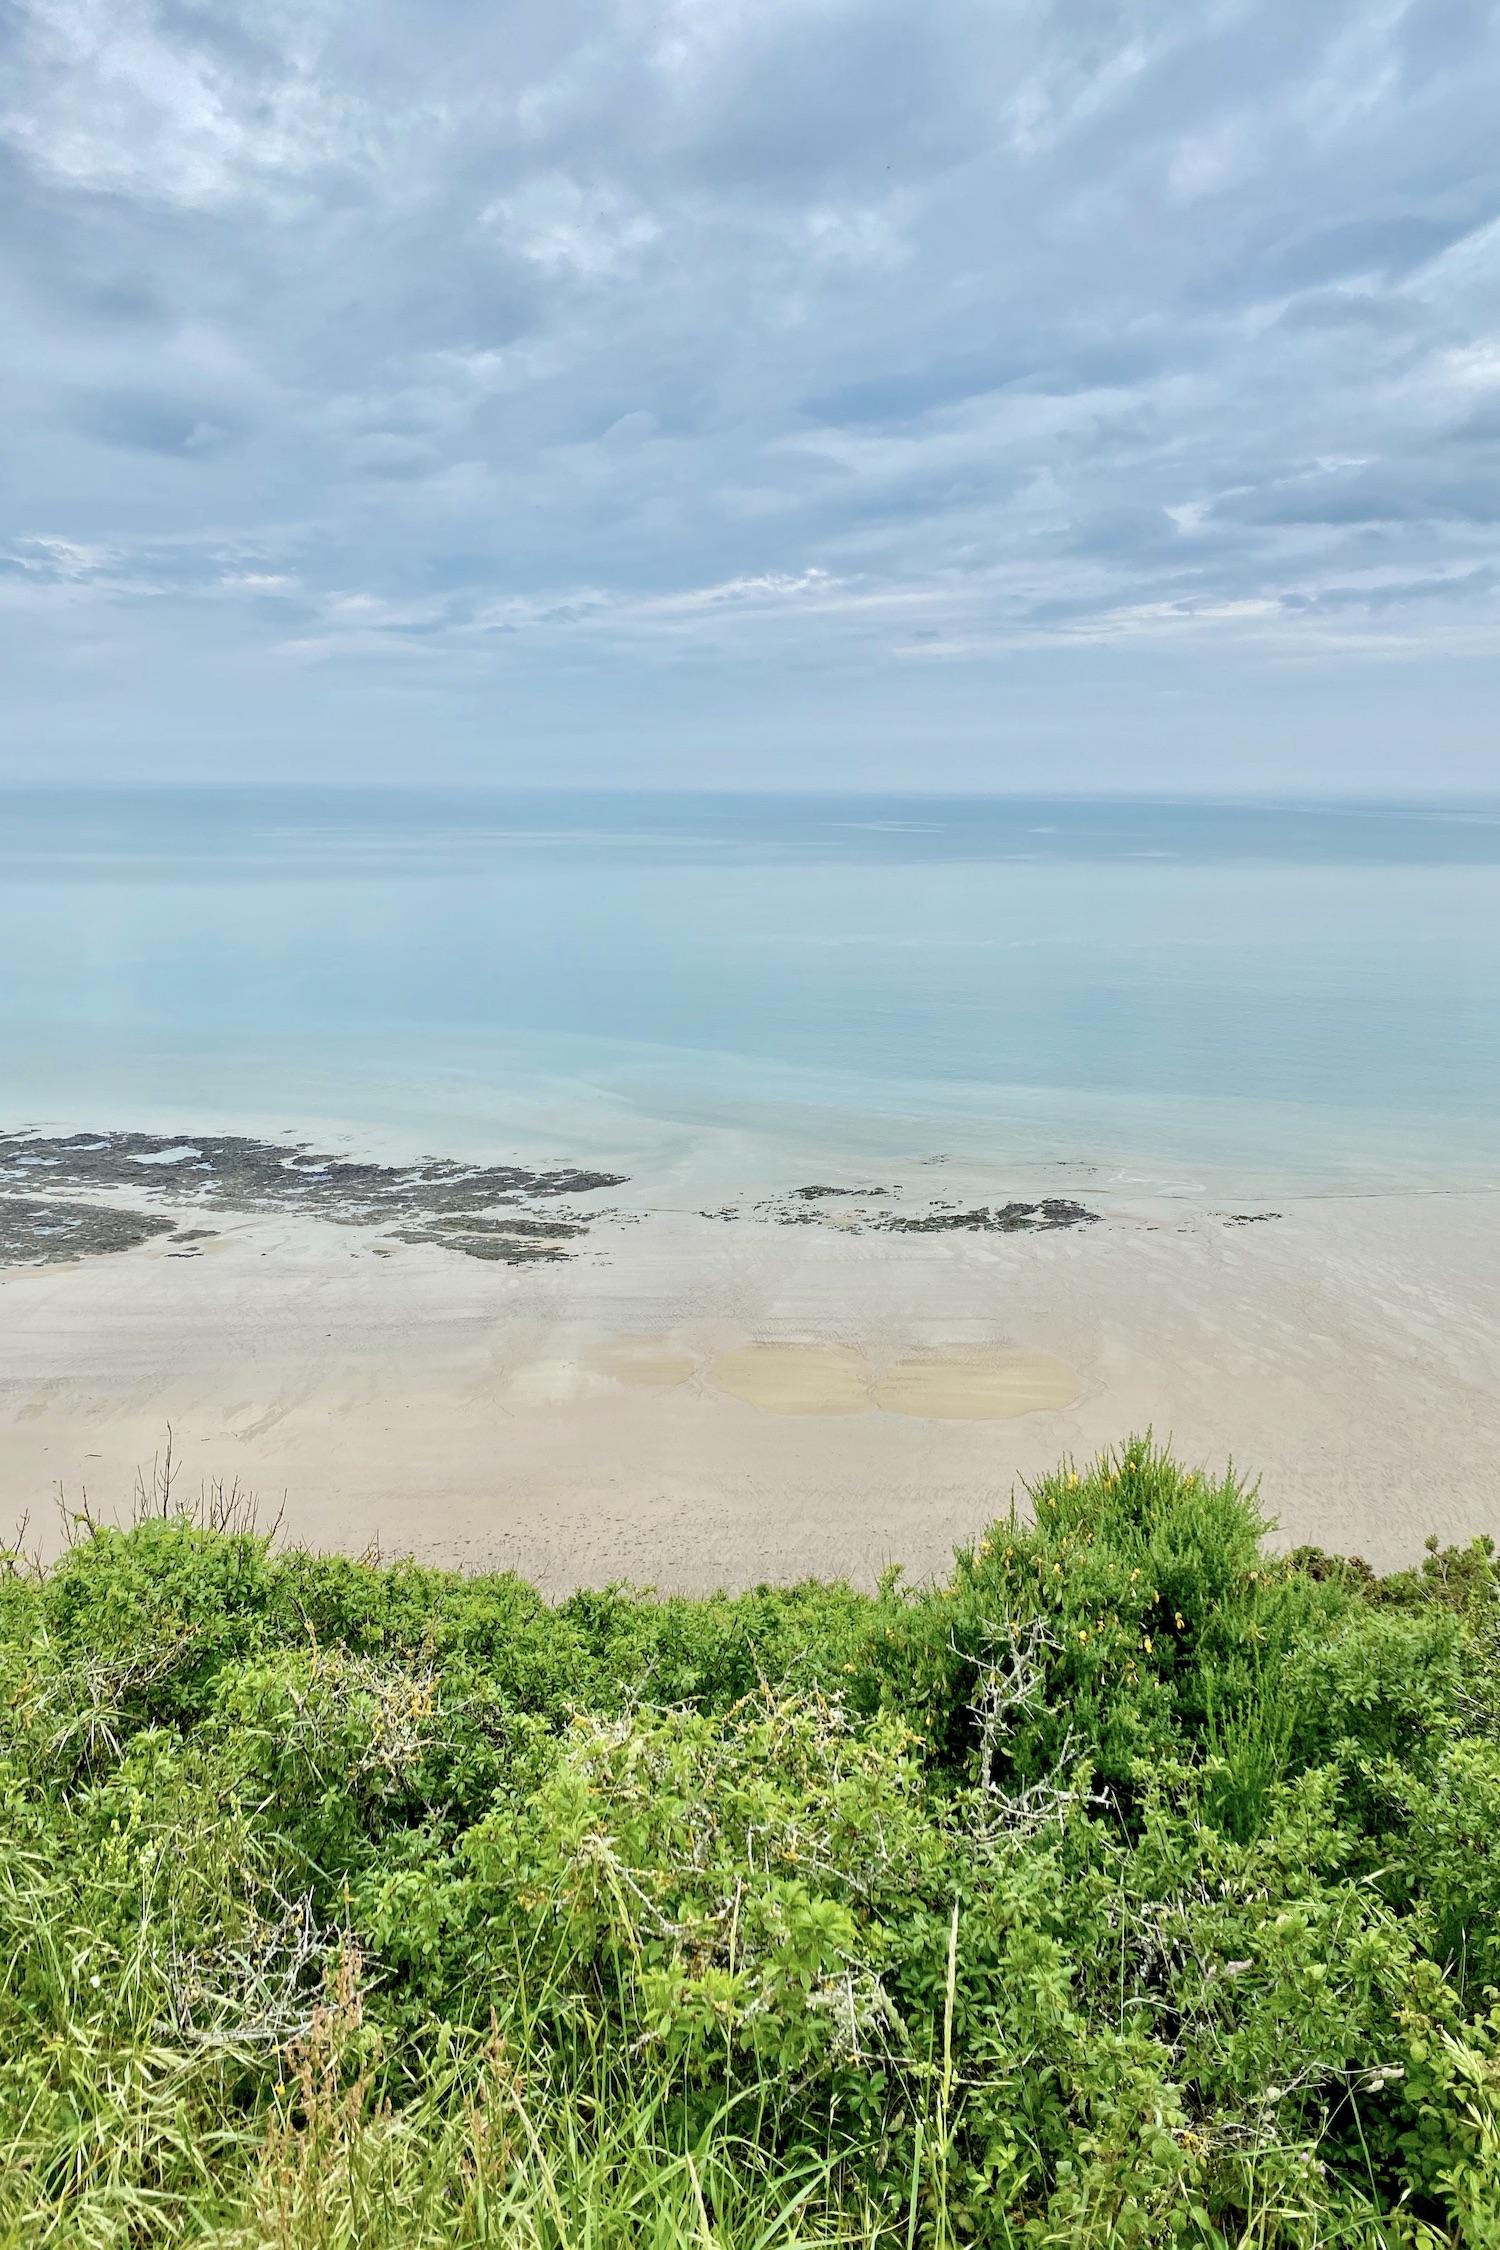 Carolles, Normandy